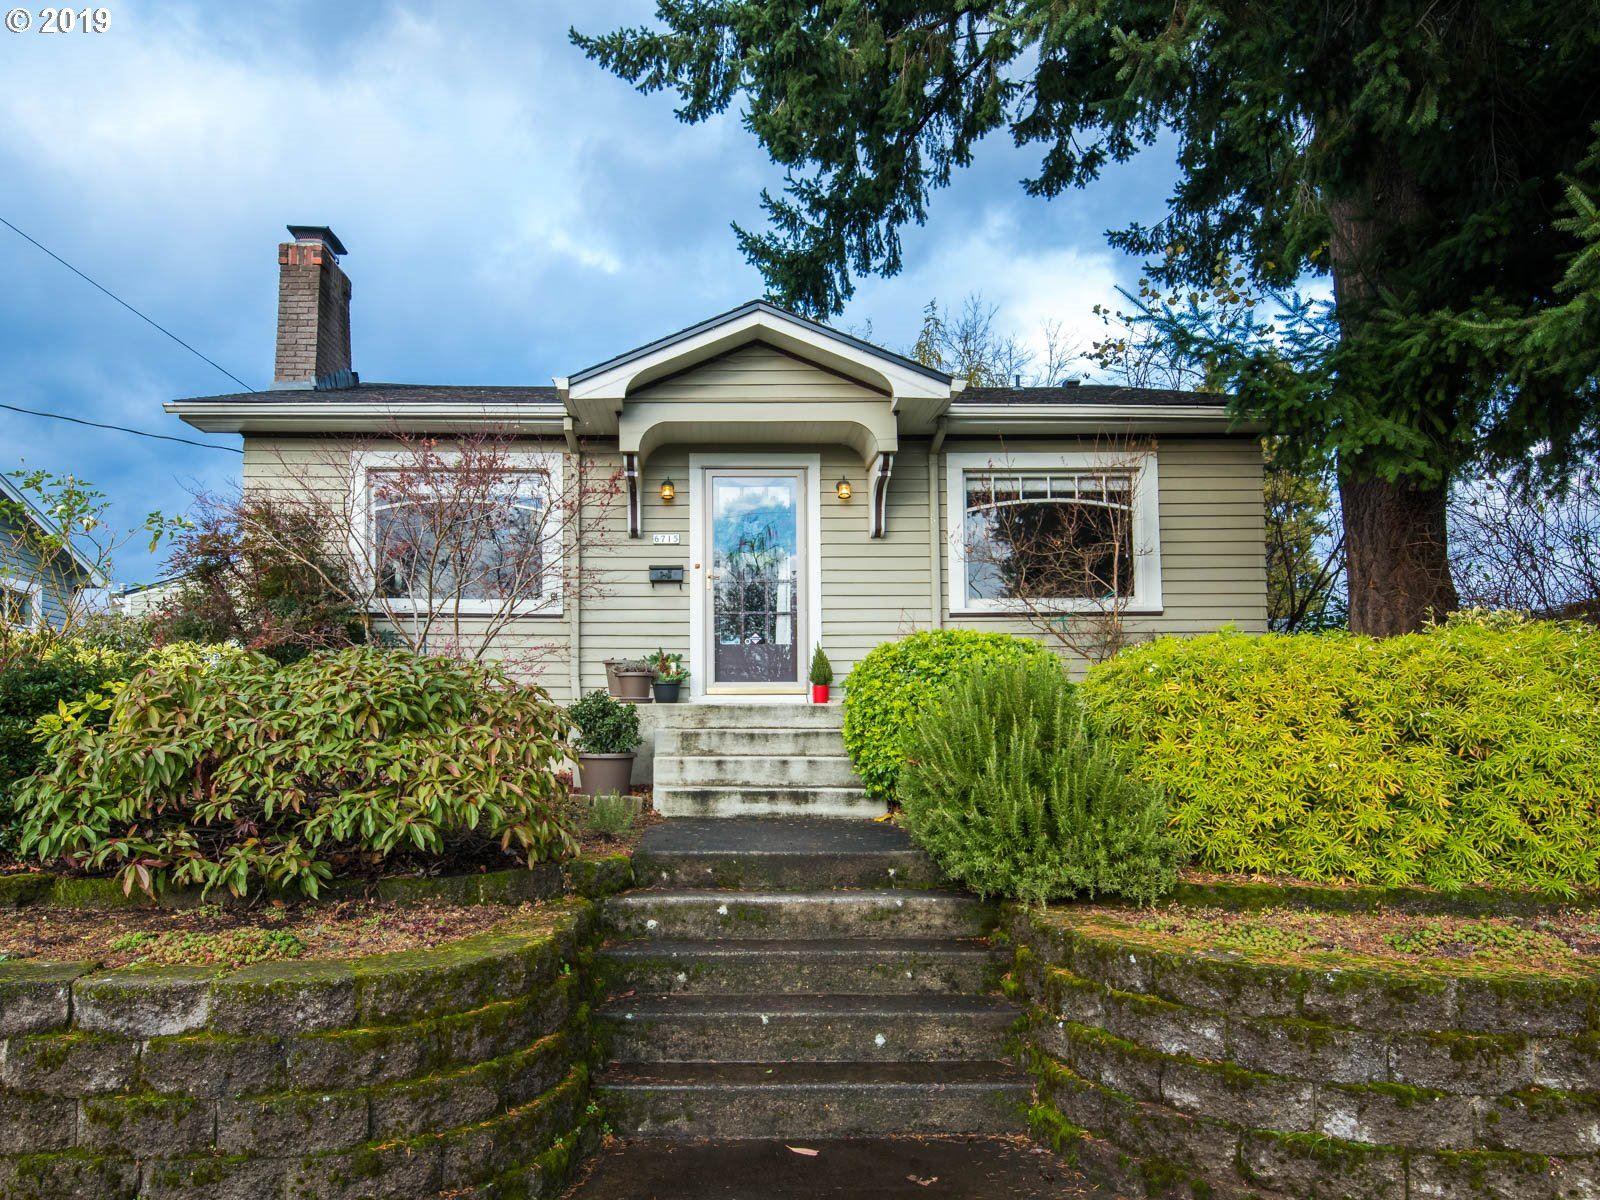 6715 NE FREMONT ST, Portland, OR 97213 - MLS#: 19391464